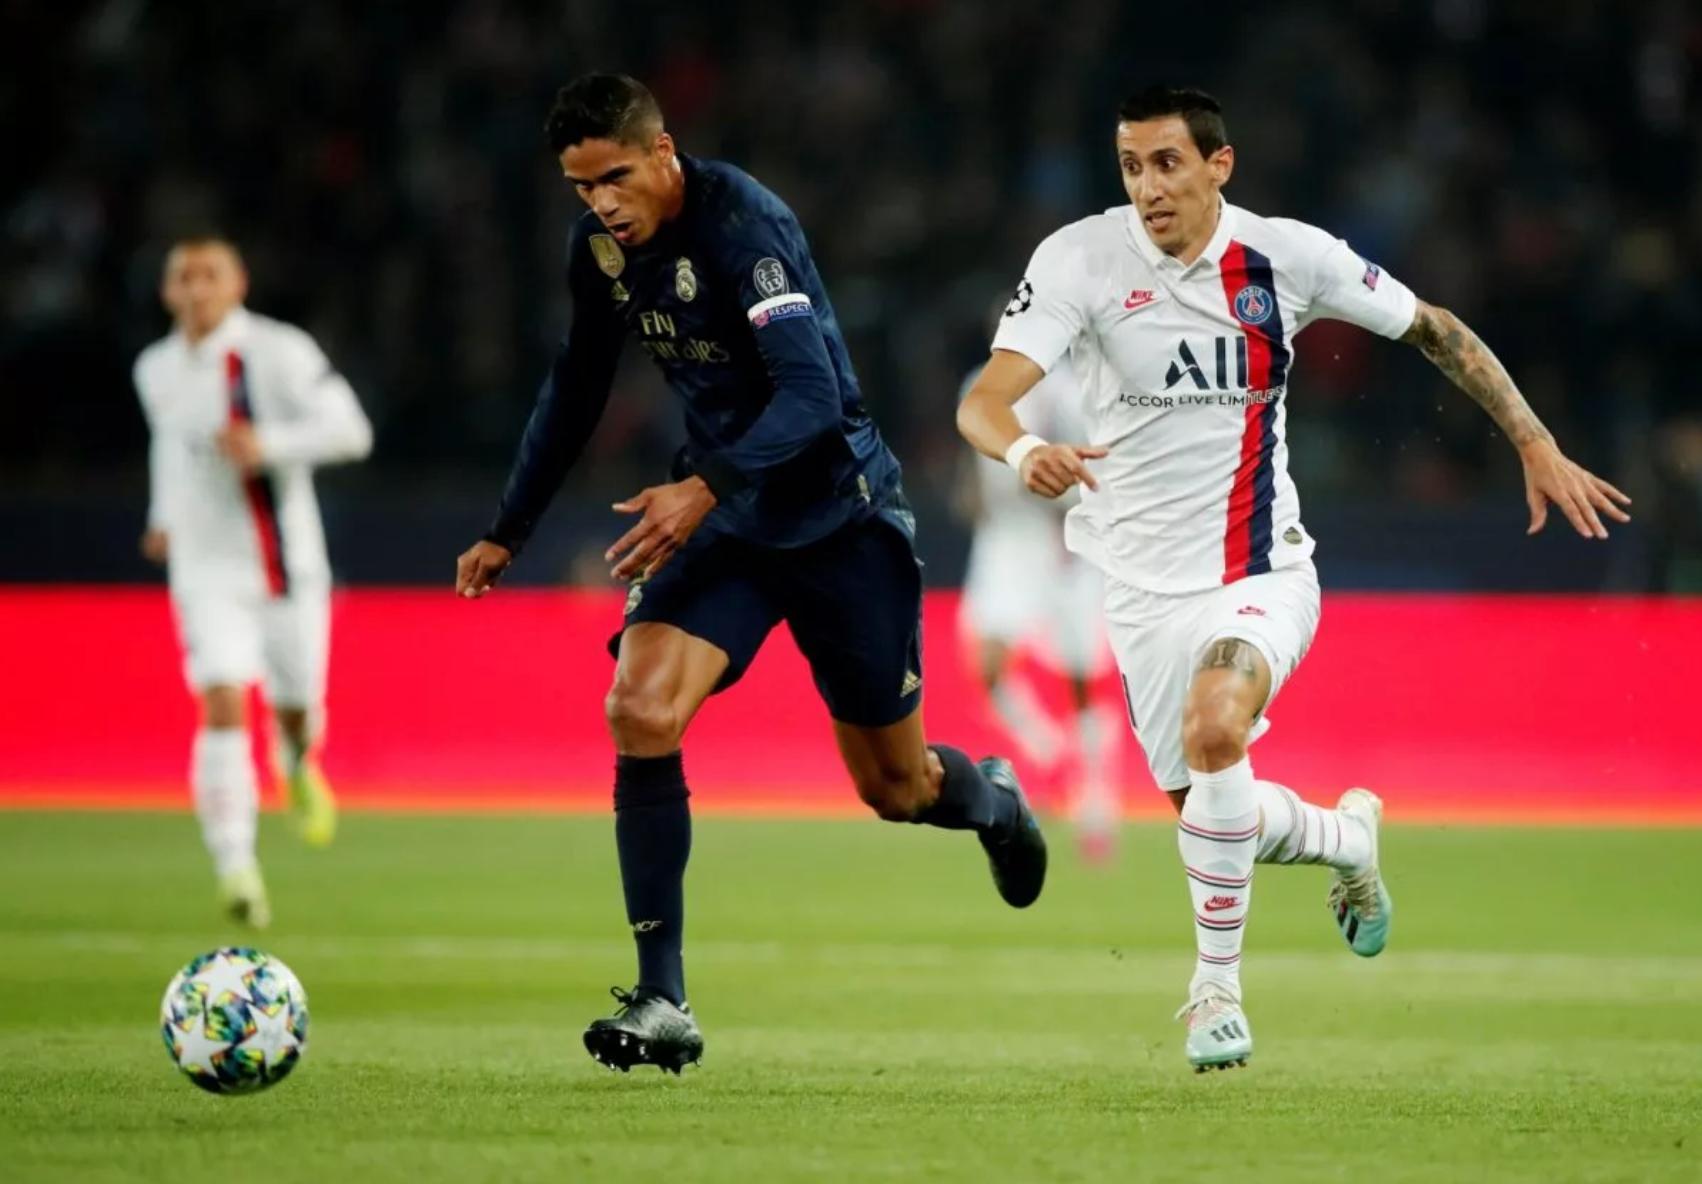 Real Madrid: Many fans have slated Raphael Varane after loss against Paris Saint-Germain - Bóng Đá